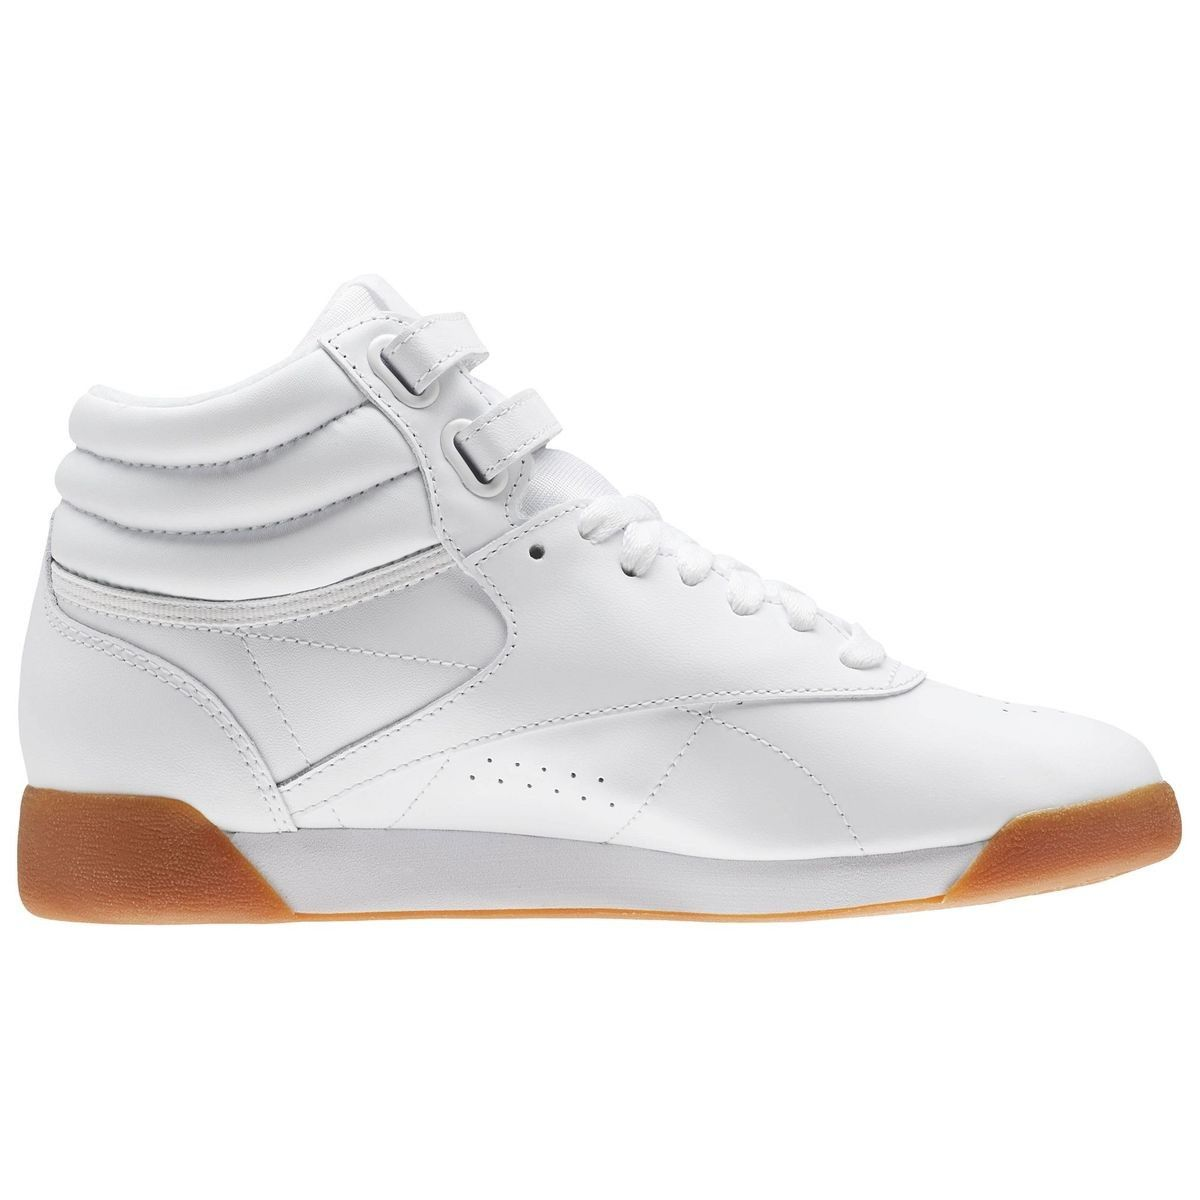 Chaussures homme REEBOK CLASSICS   La Redoute